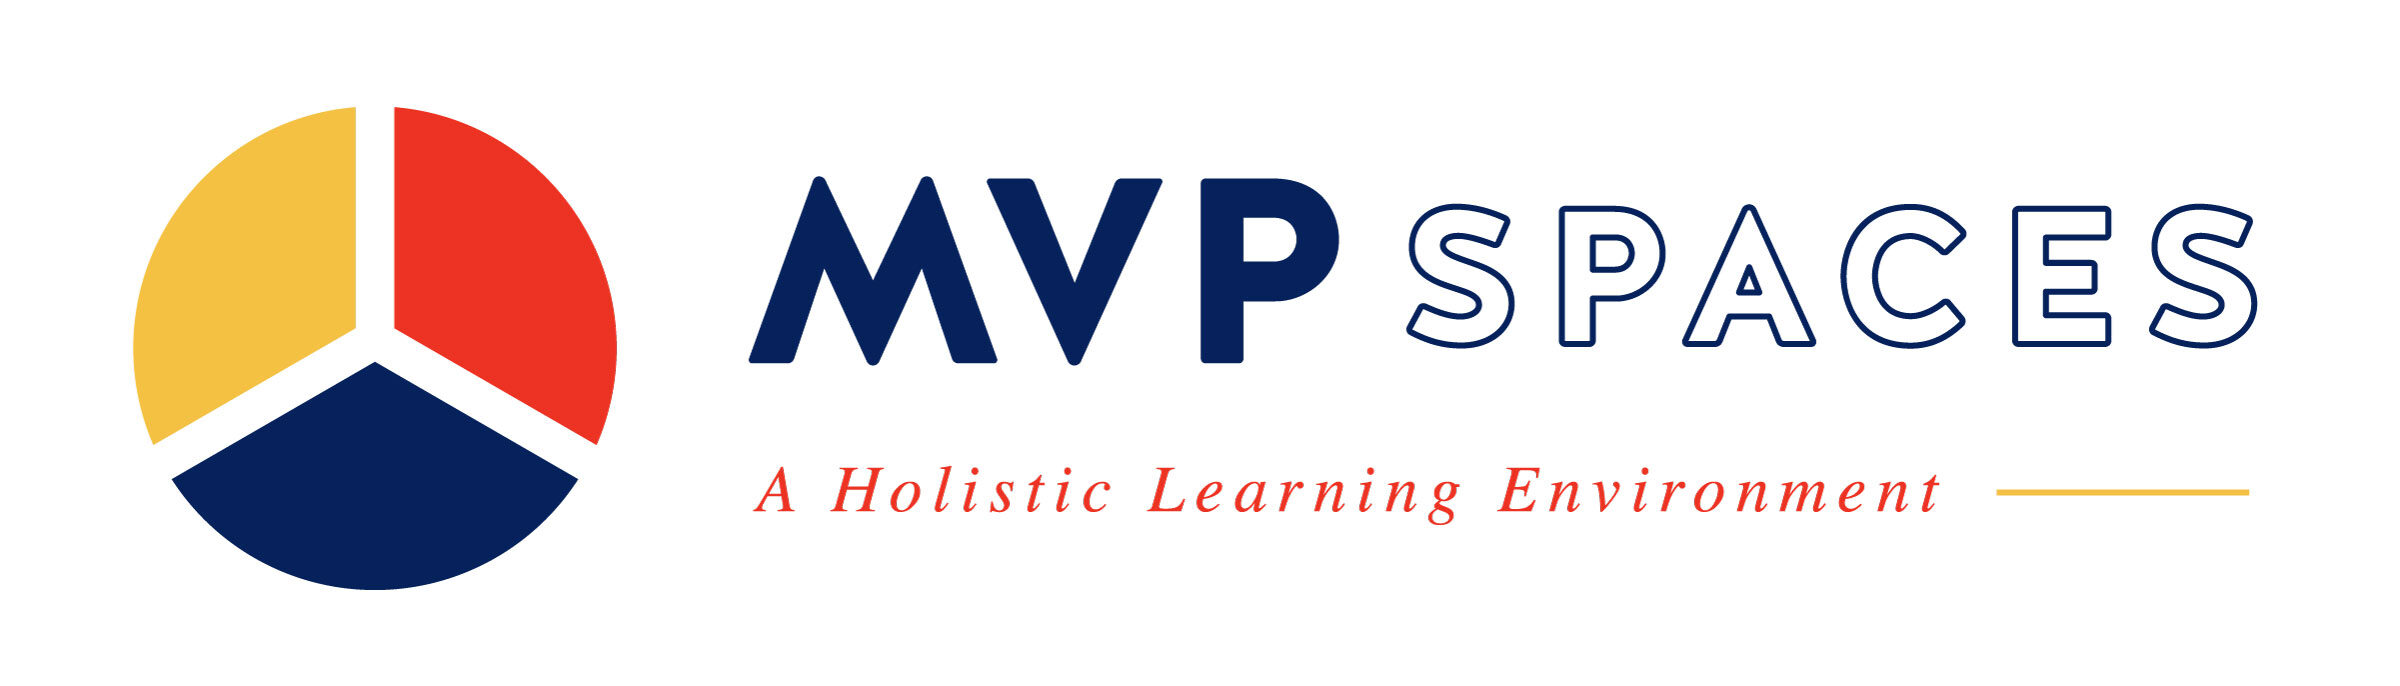 MVP Spaces